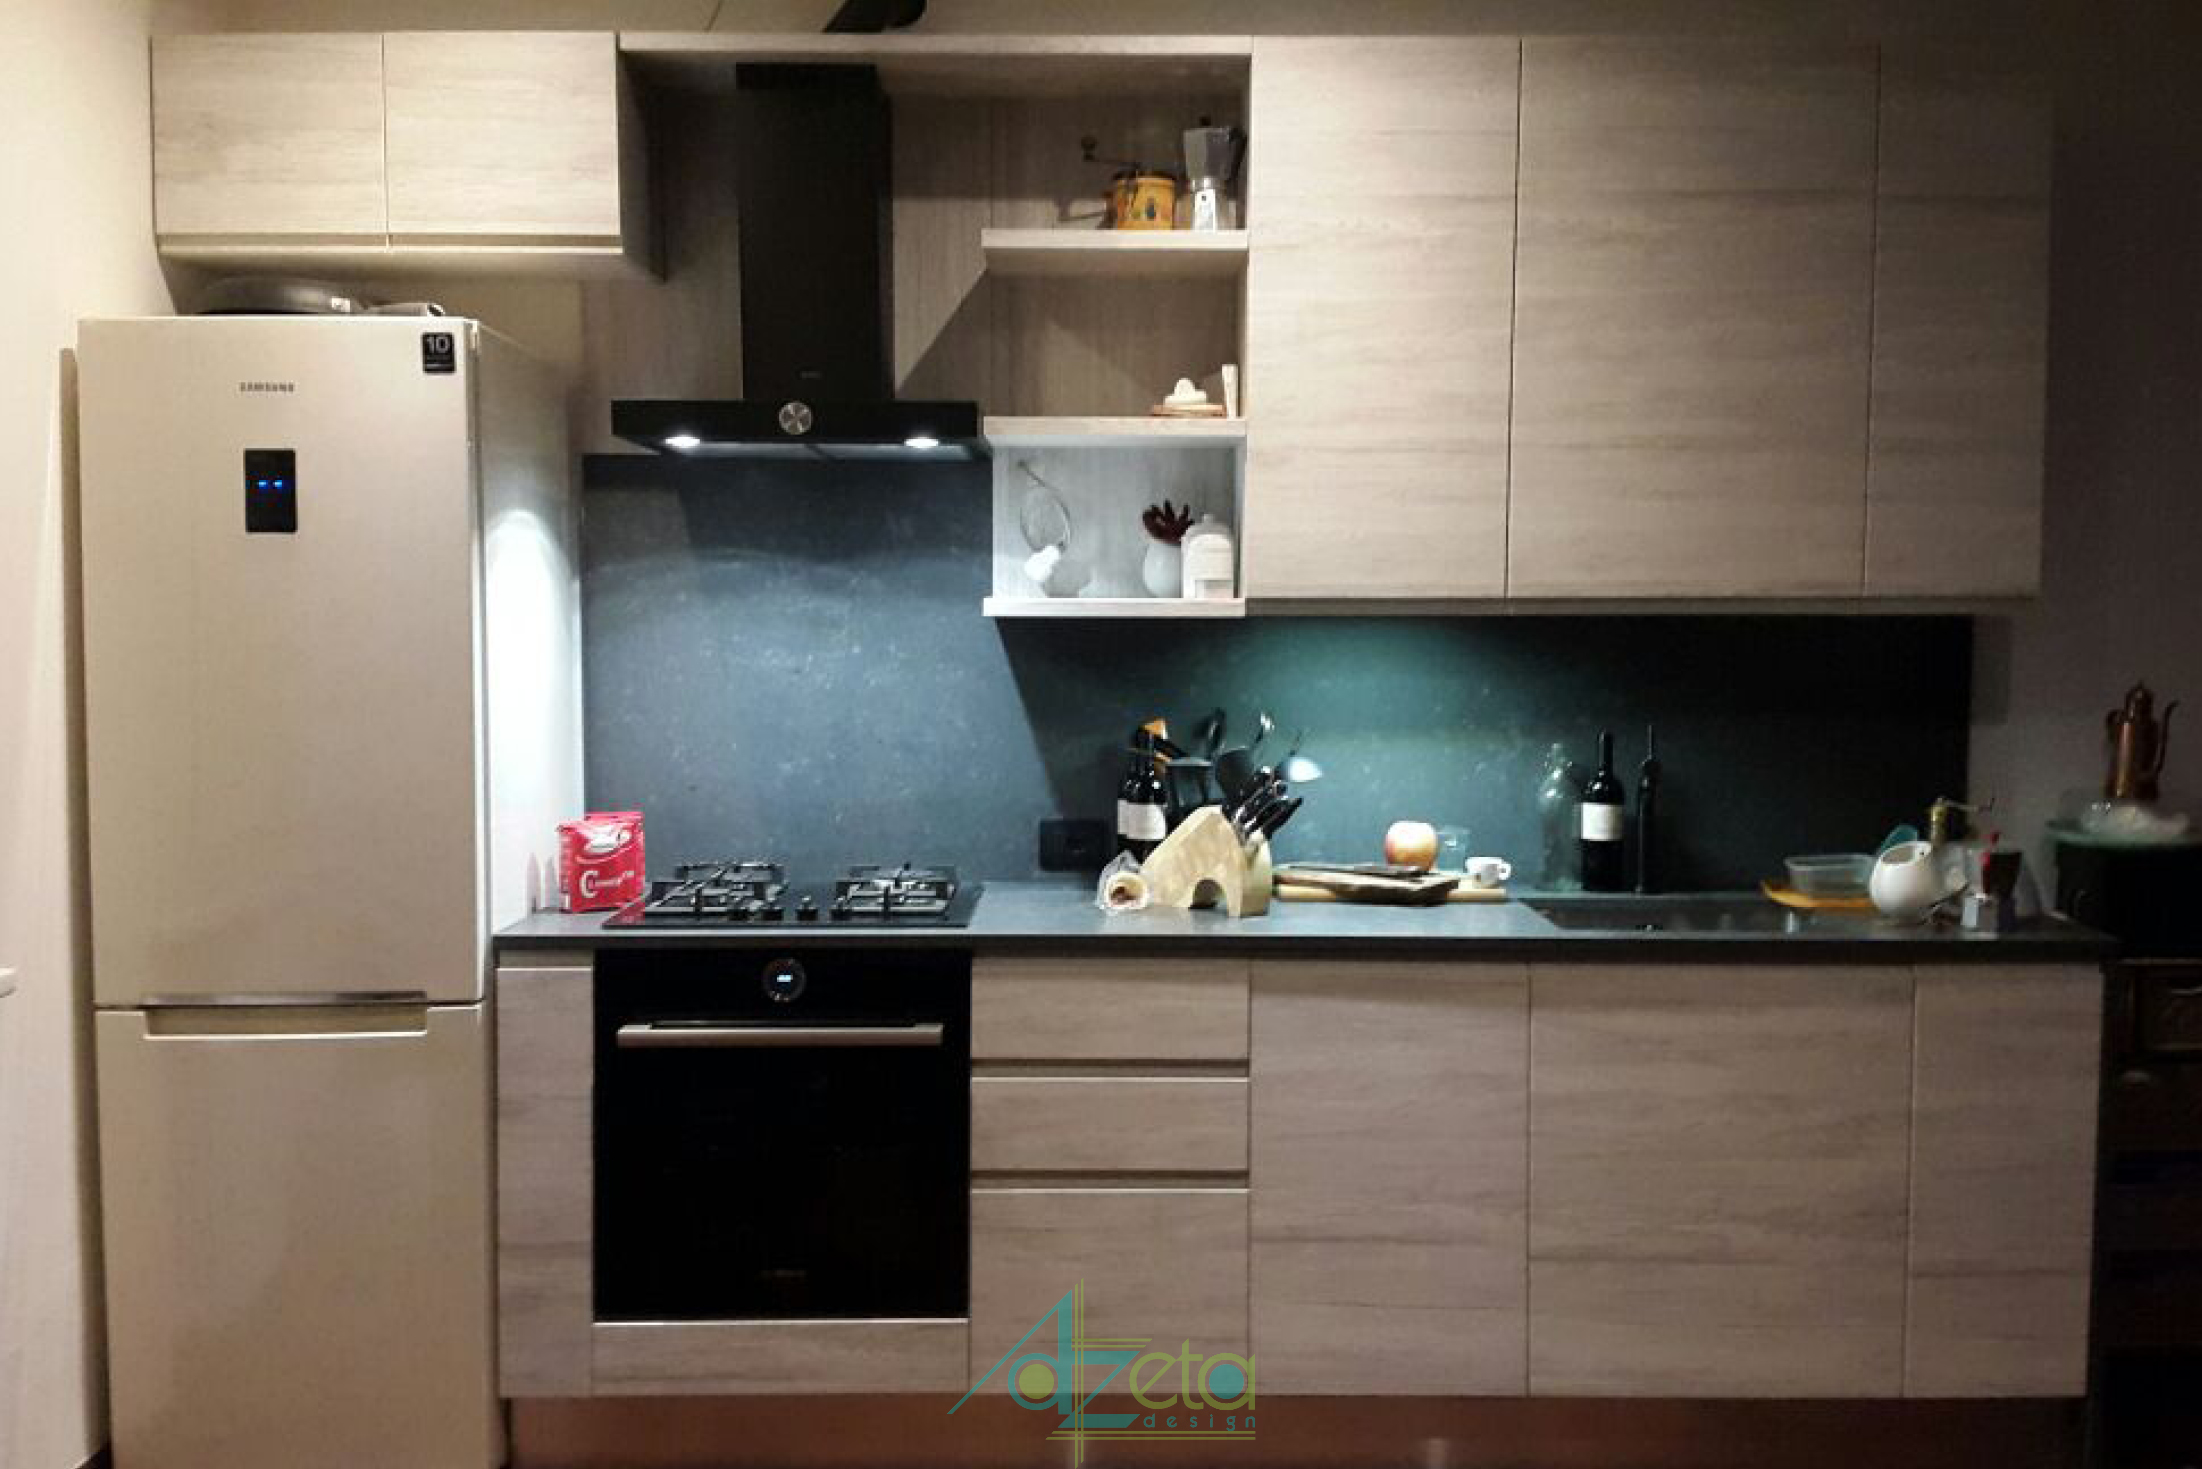 Cucine Usate Parma - emejing cucine usate modena pictures, cucine ...